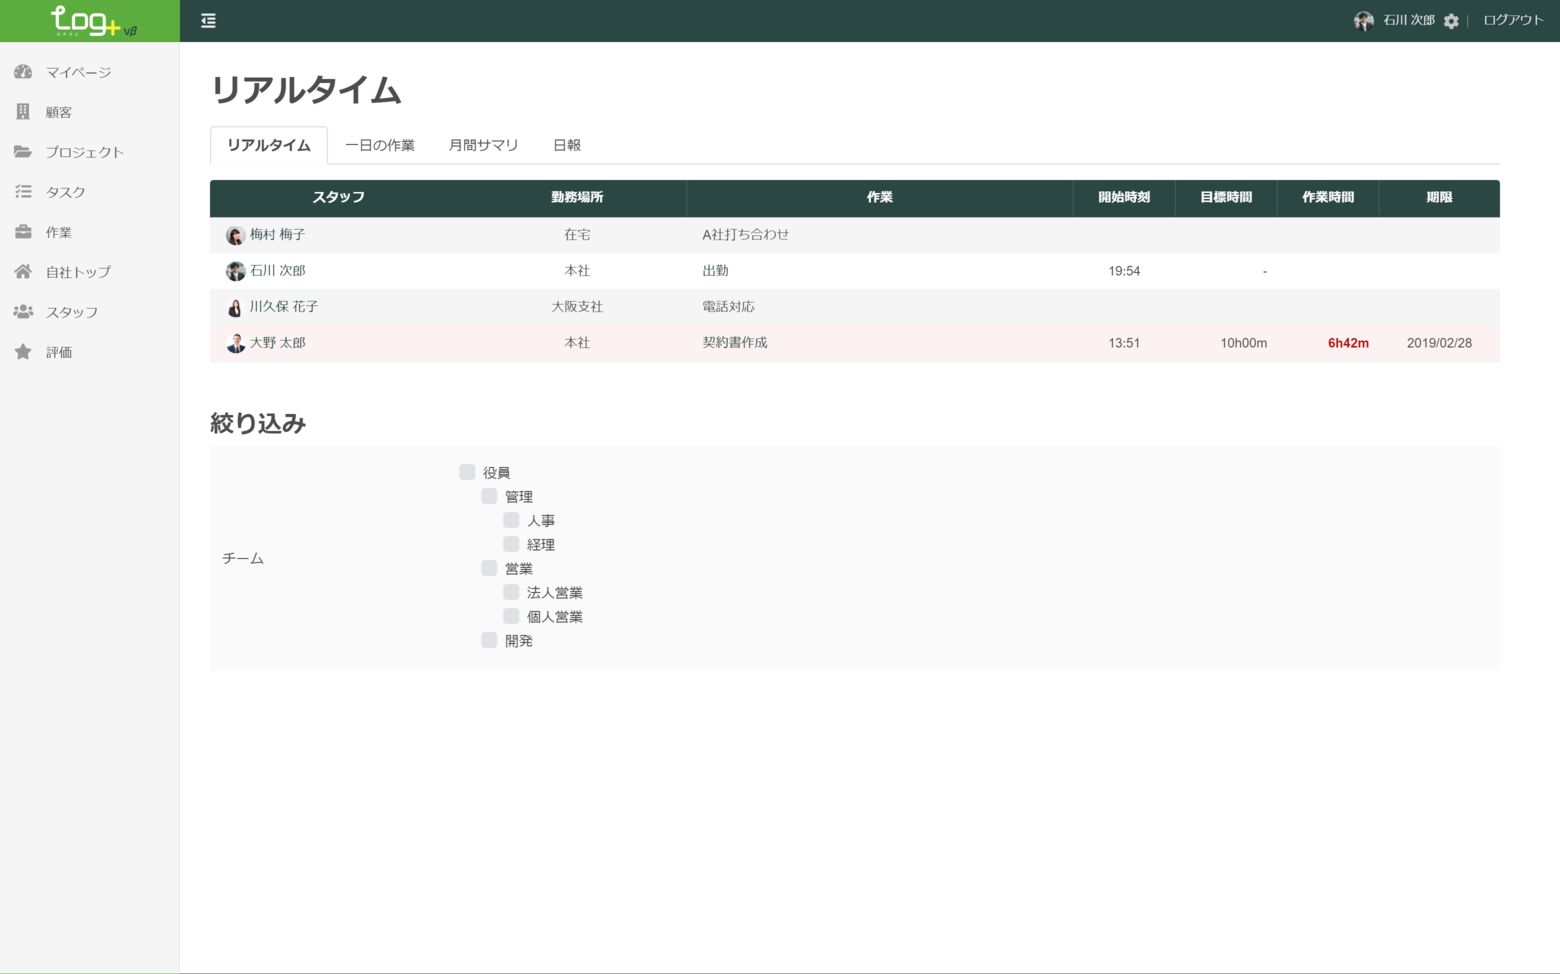 logtas.jp_staff_company_now_.png